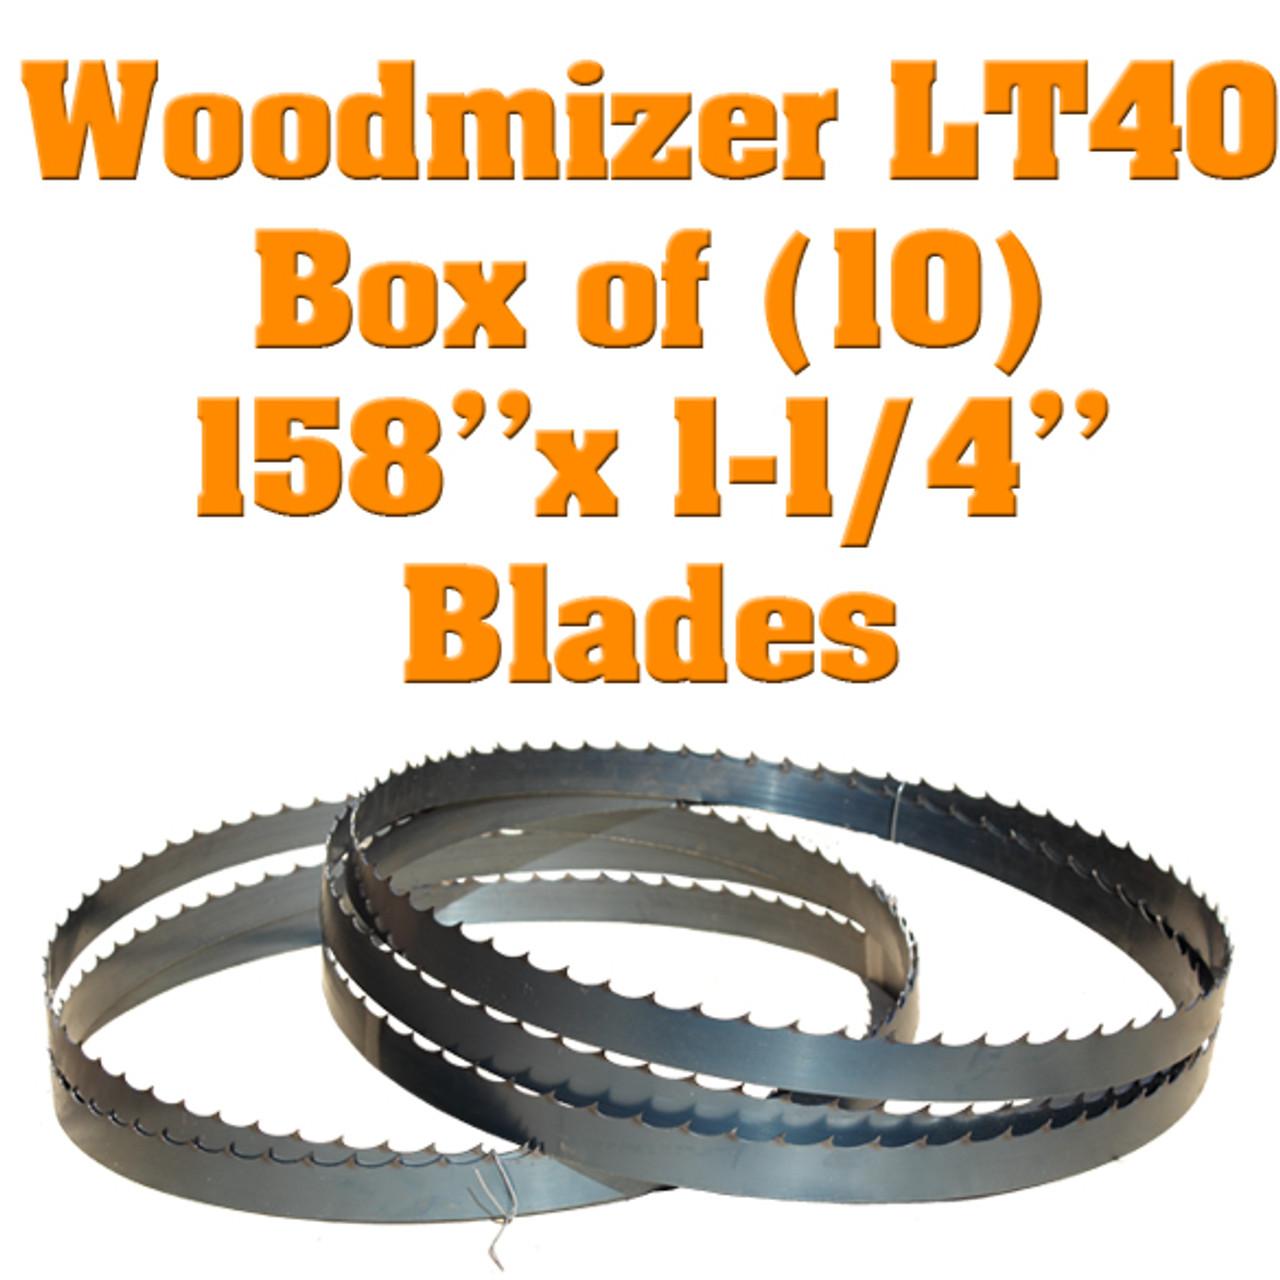 Box of 10 Blades Woodmizer LT40